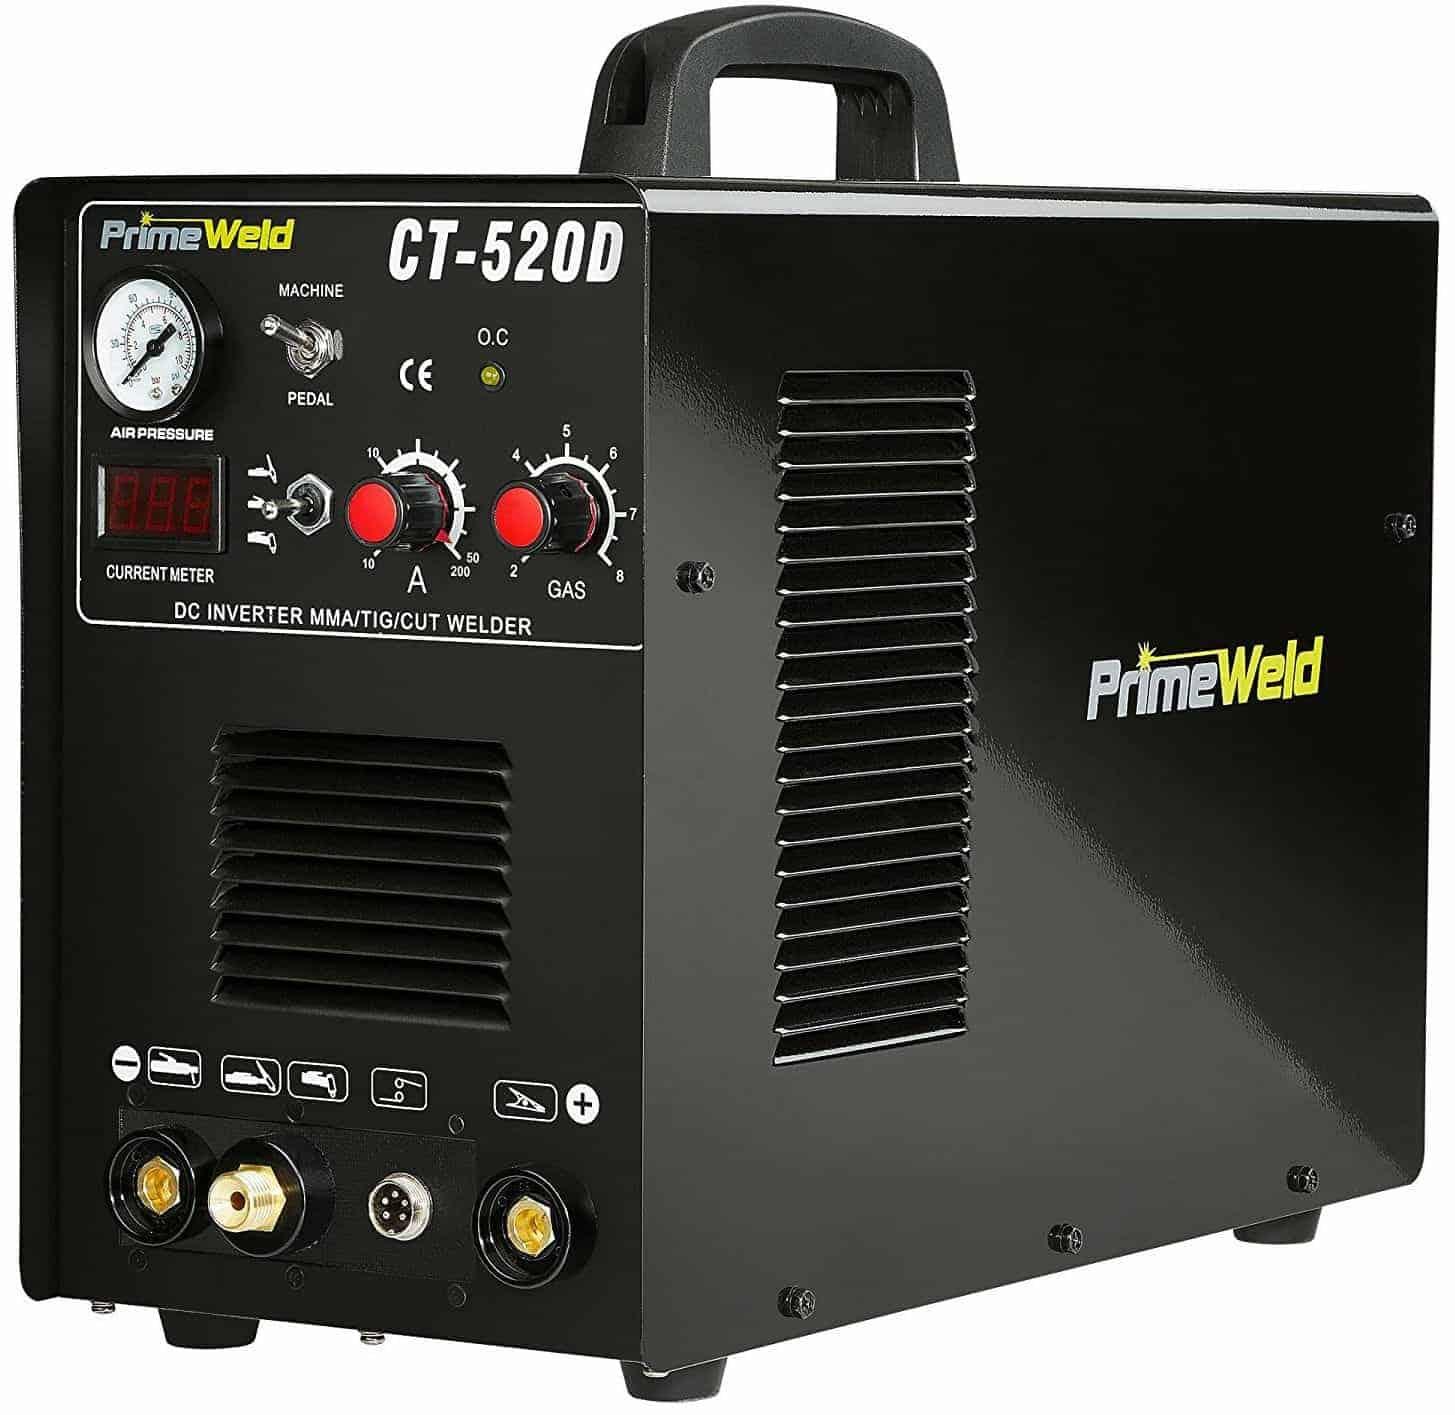 PrimeWeld Ct520d 50 Amps Plasma Cutter, 200 Amps Tig Welder